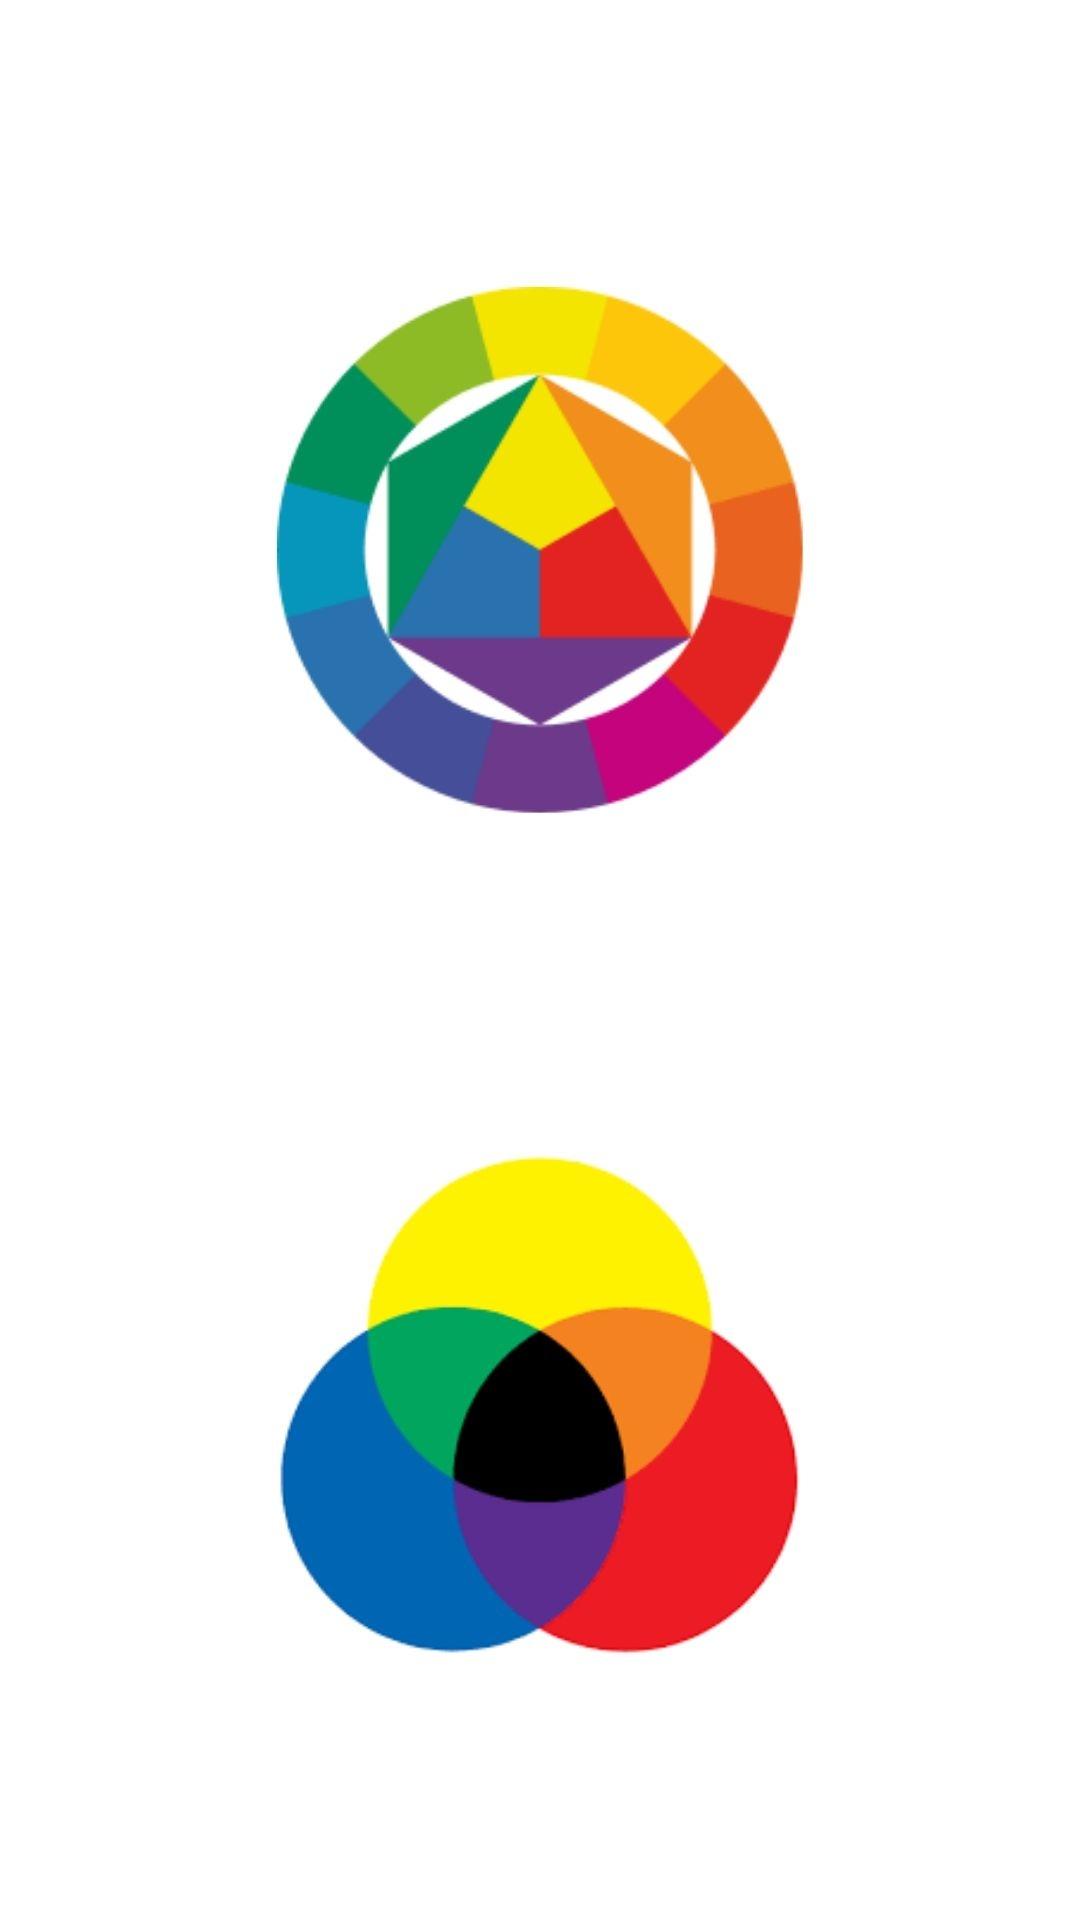 image-blog-2-seance-studio-haute-couleur-rouen-studio-matpix